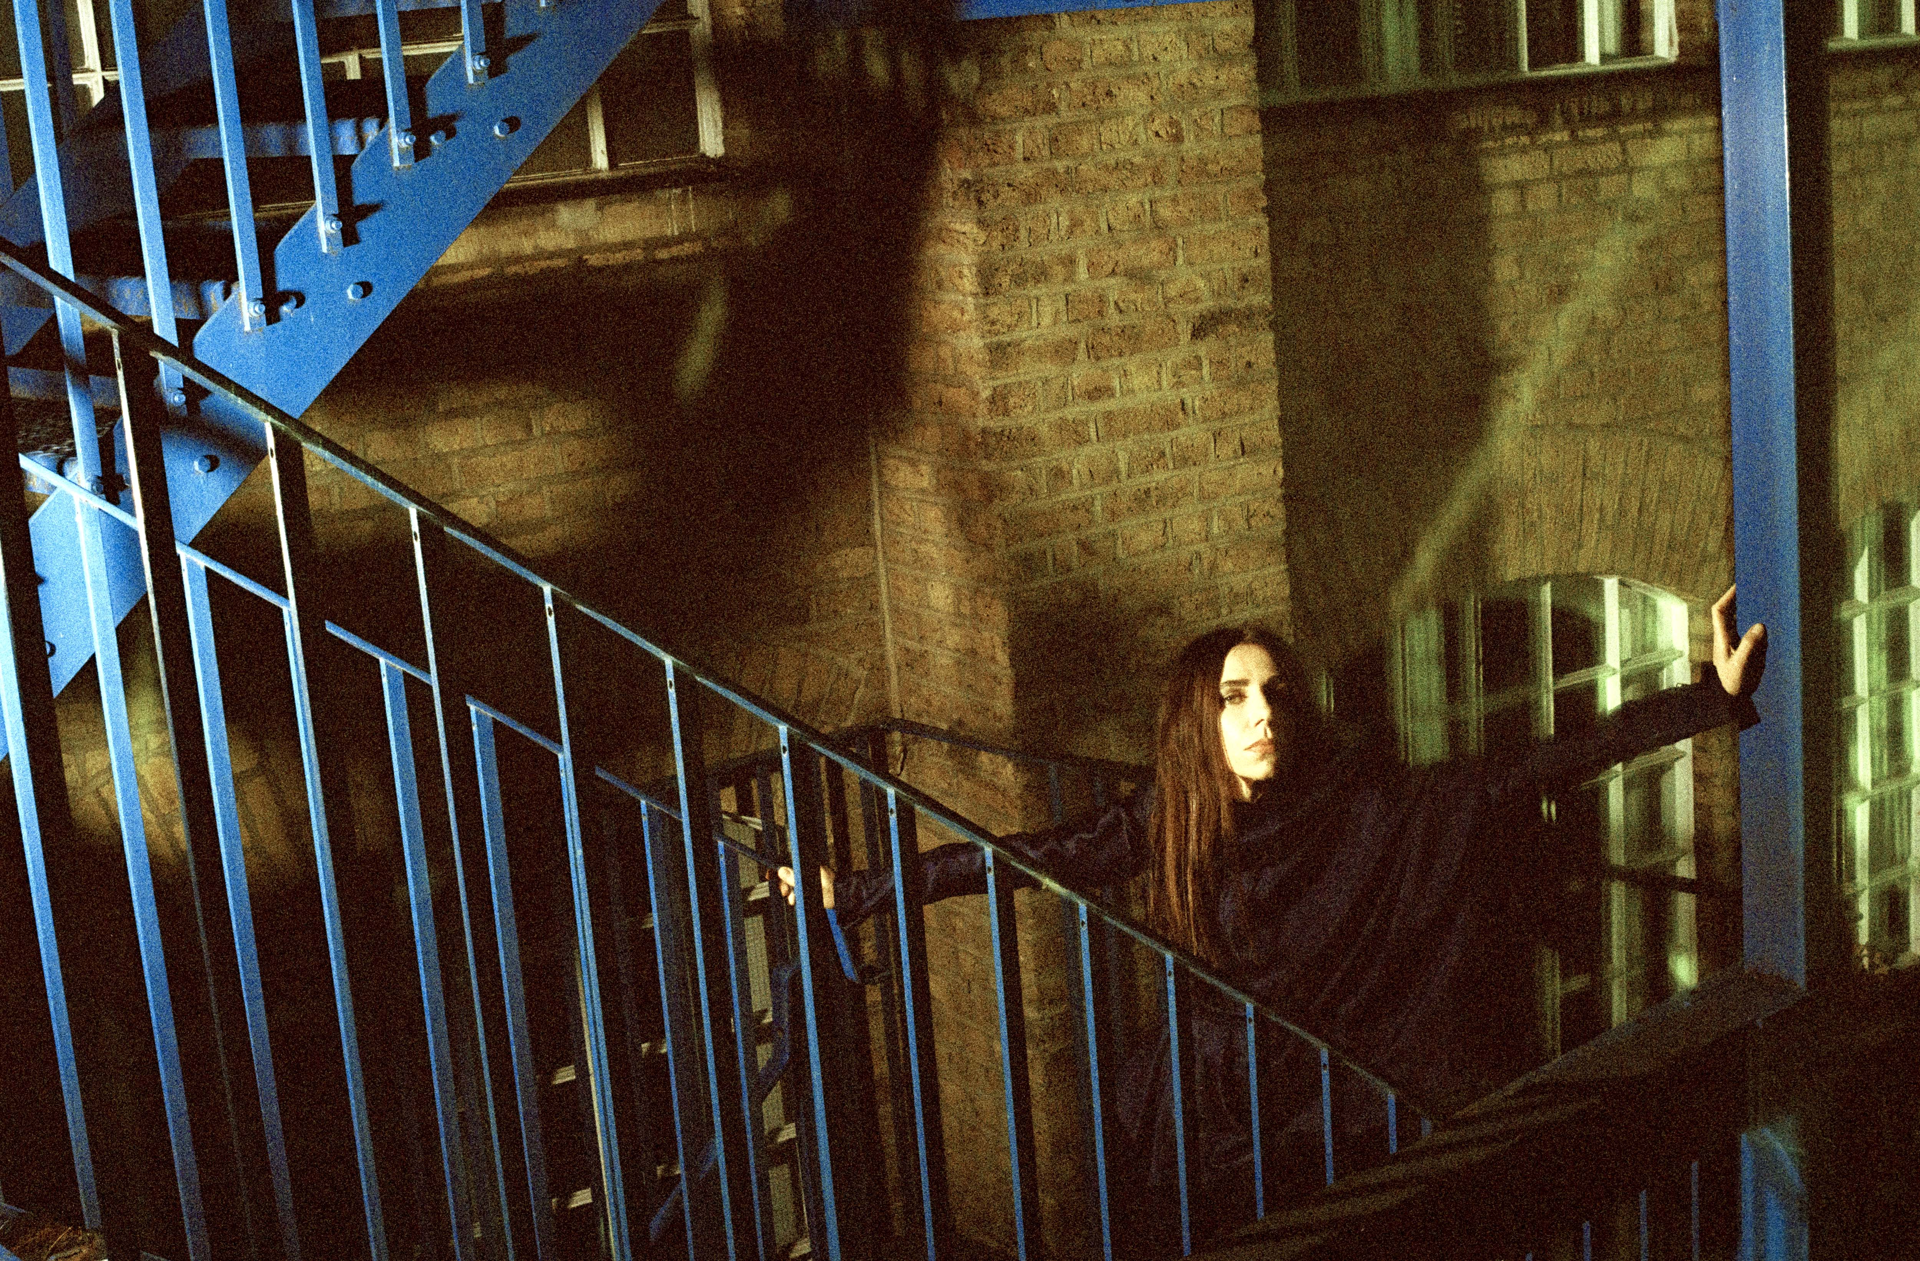 NEWS: PJ Harvey shares new single 'The Community of Hope'